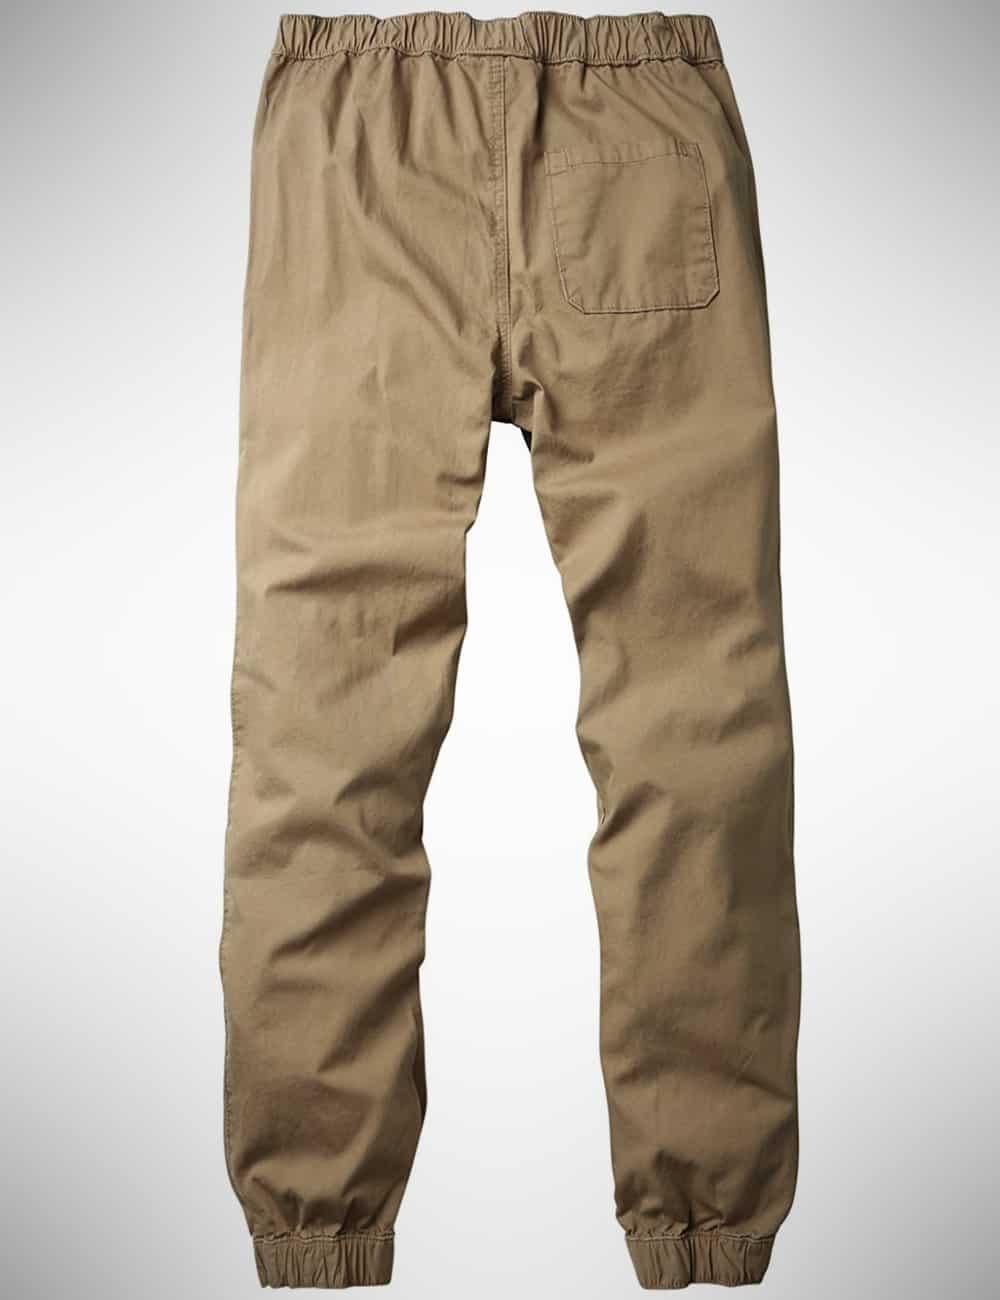 Match Loose Fit Jogger Pants